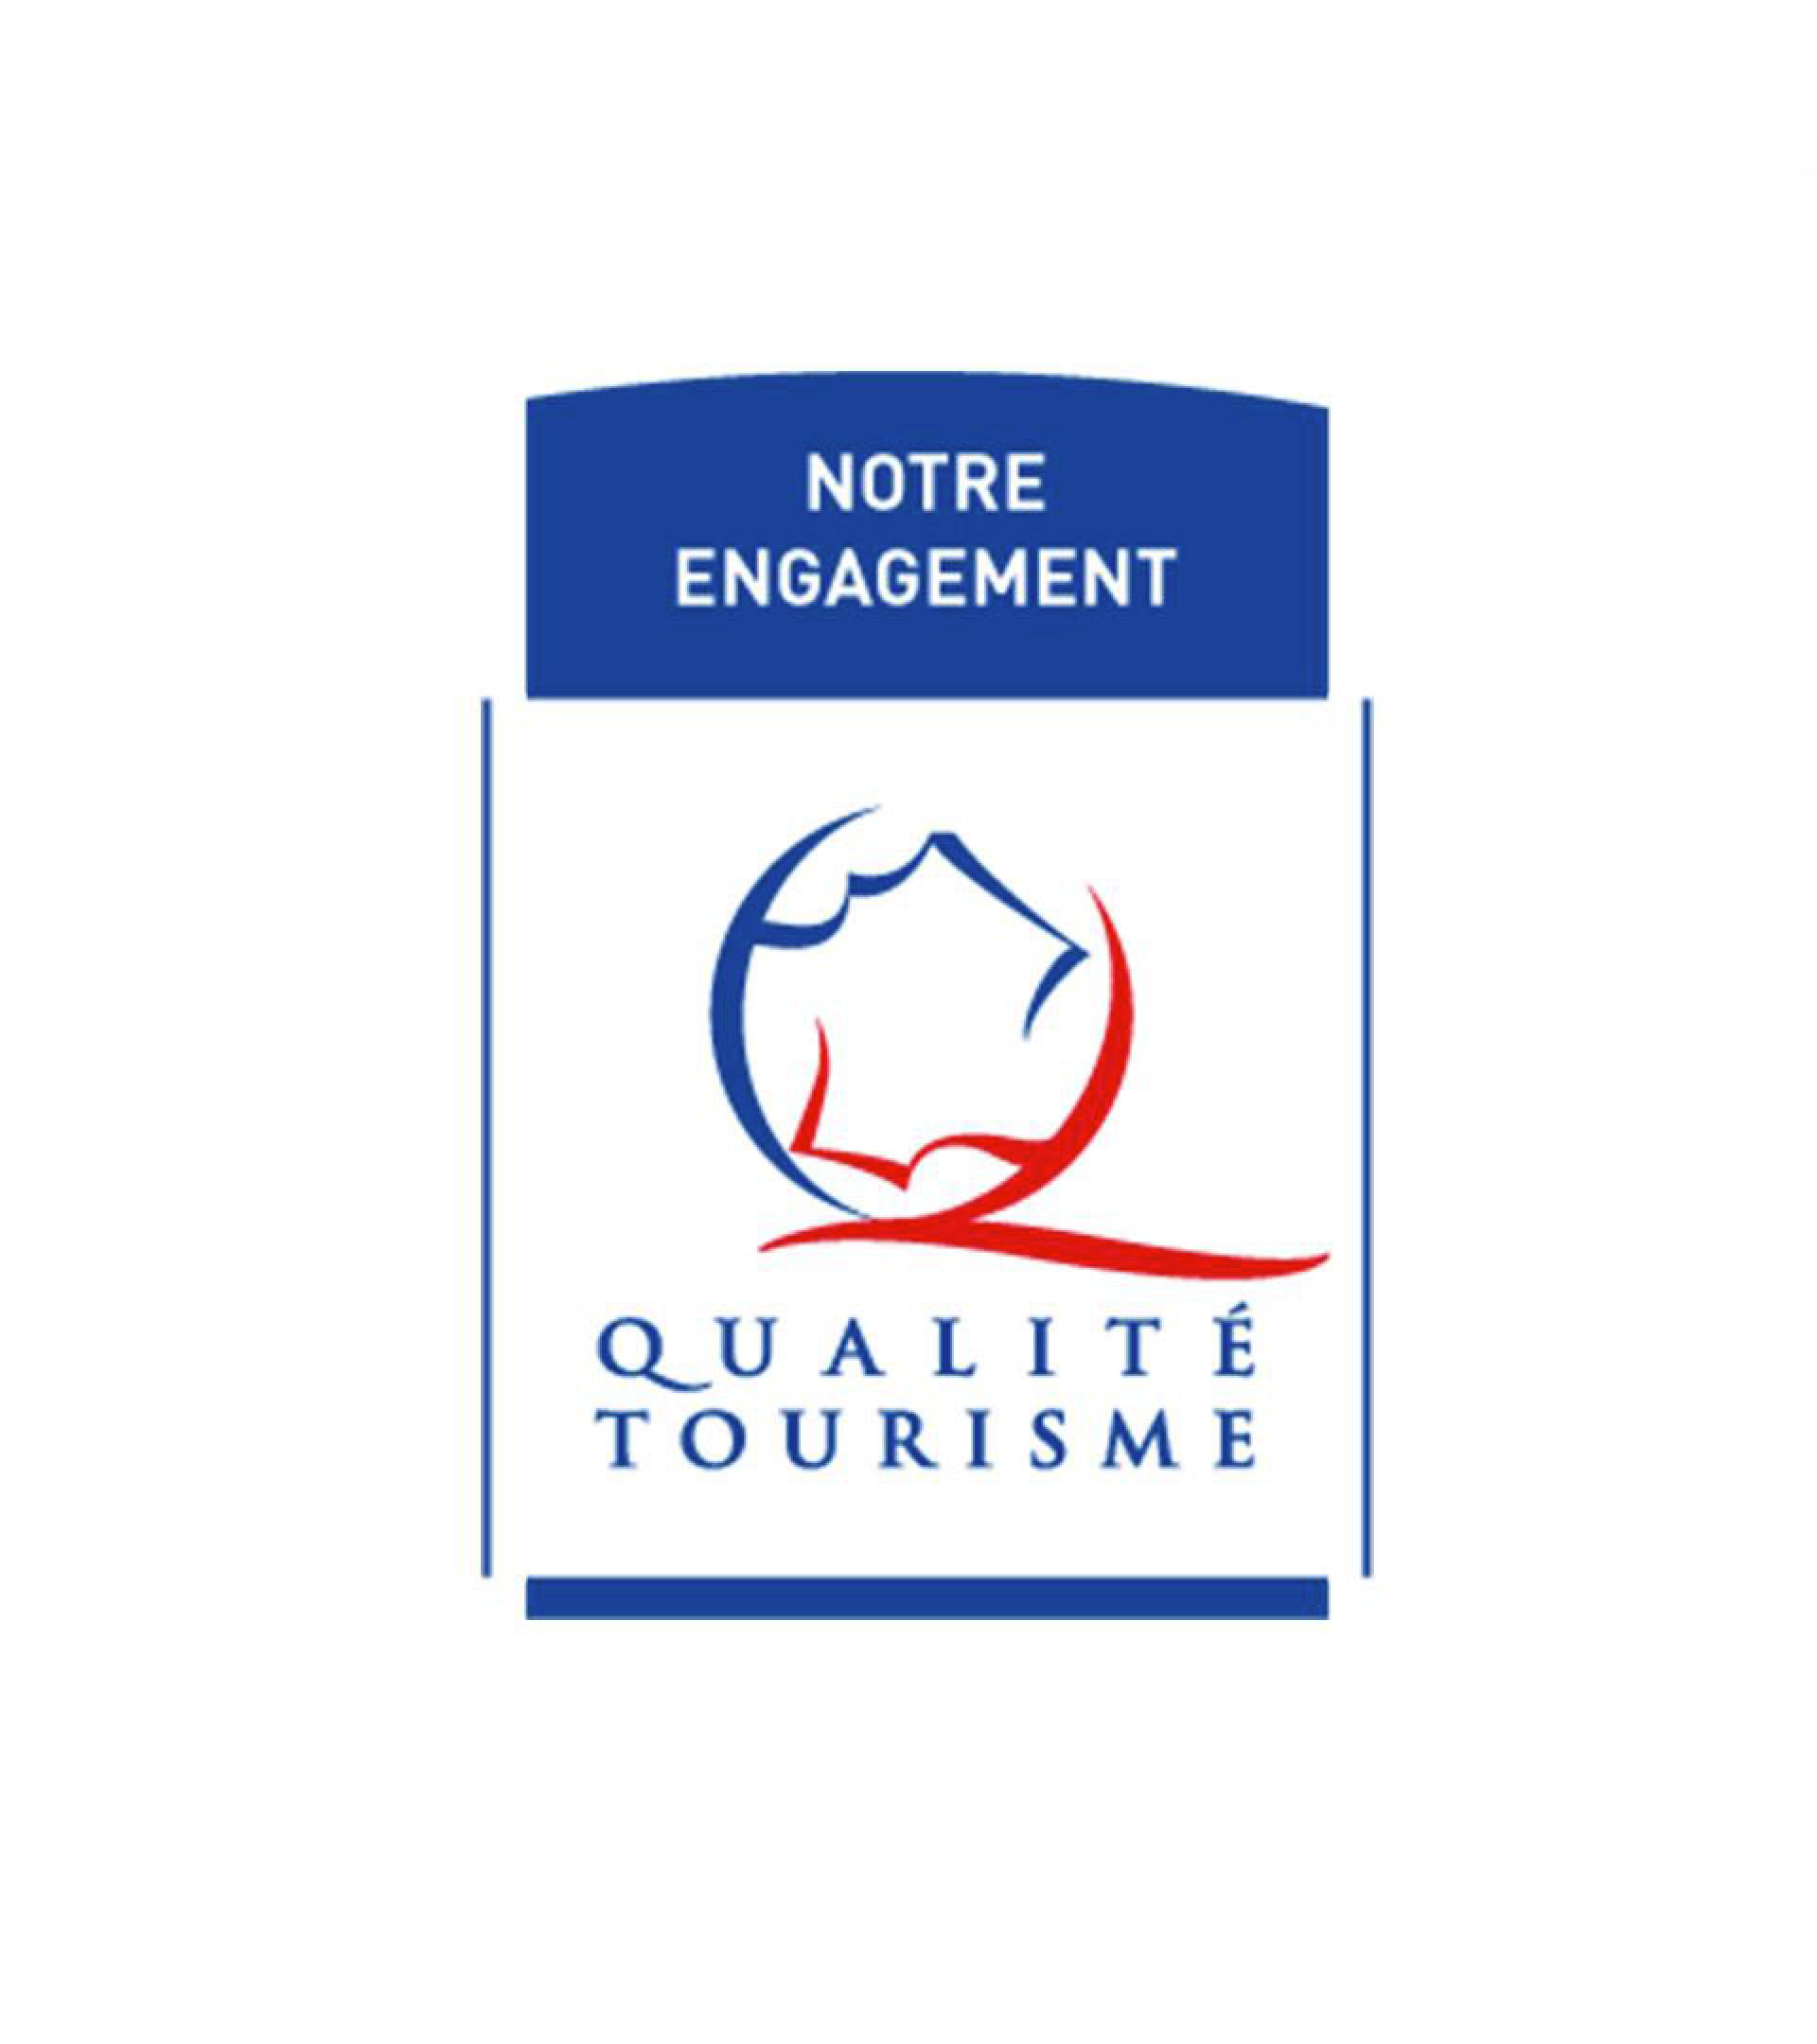 Qualite Tourisme Saint Nazaire